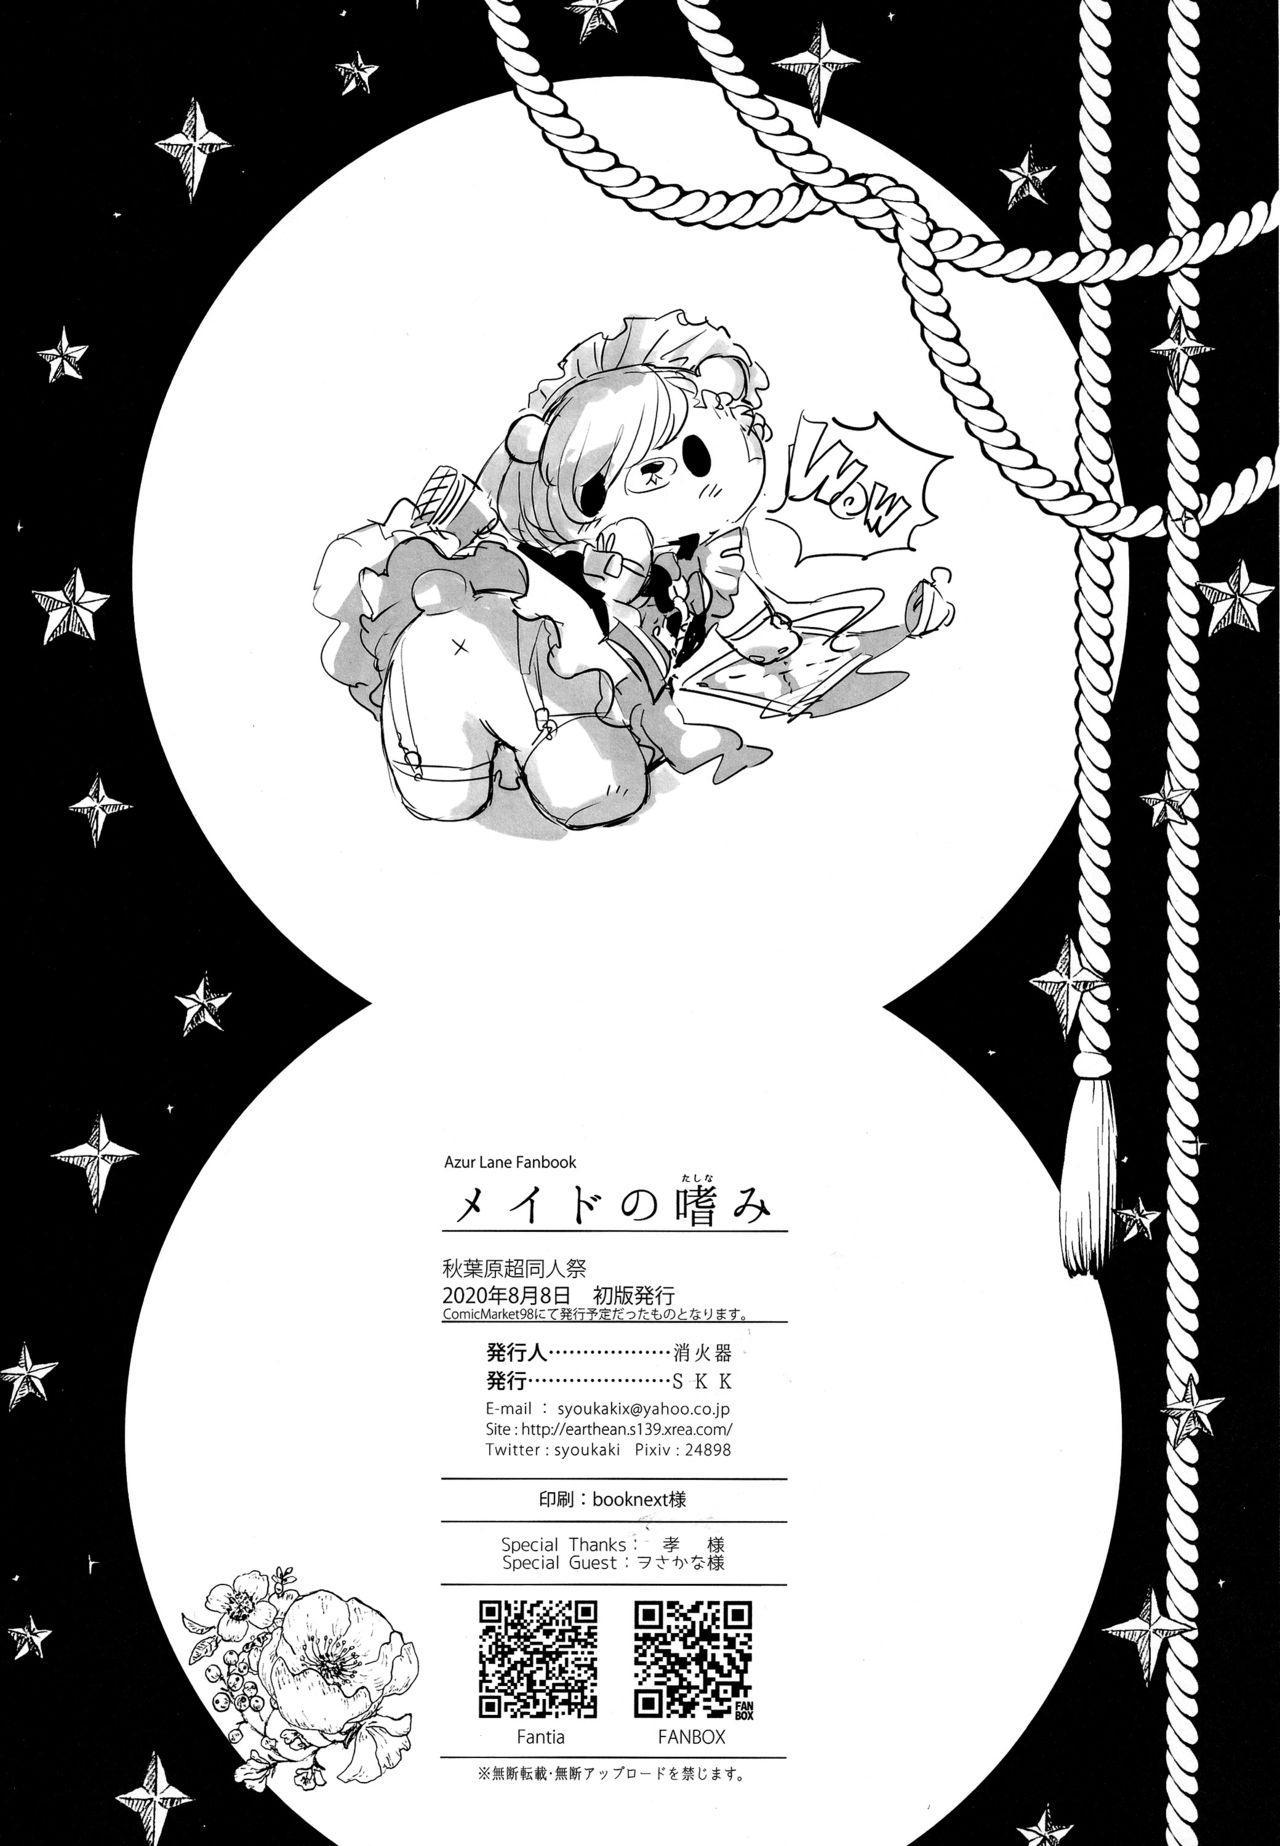 Maid no Tashinami - Discretion of the maid 24